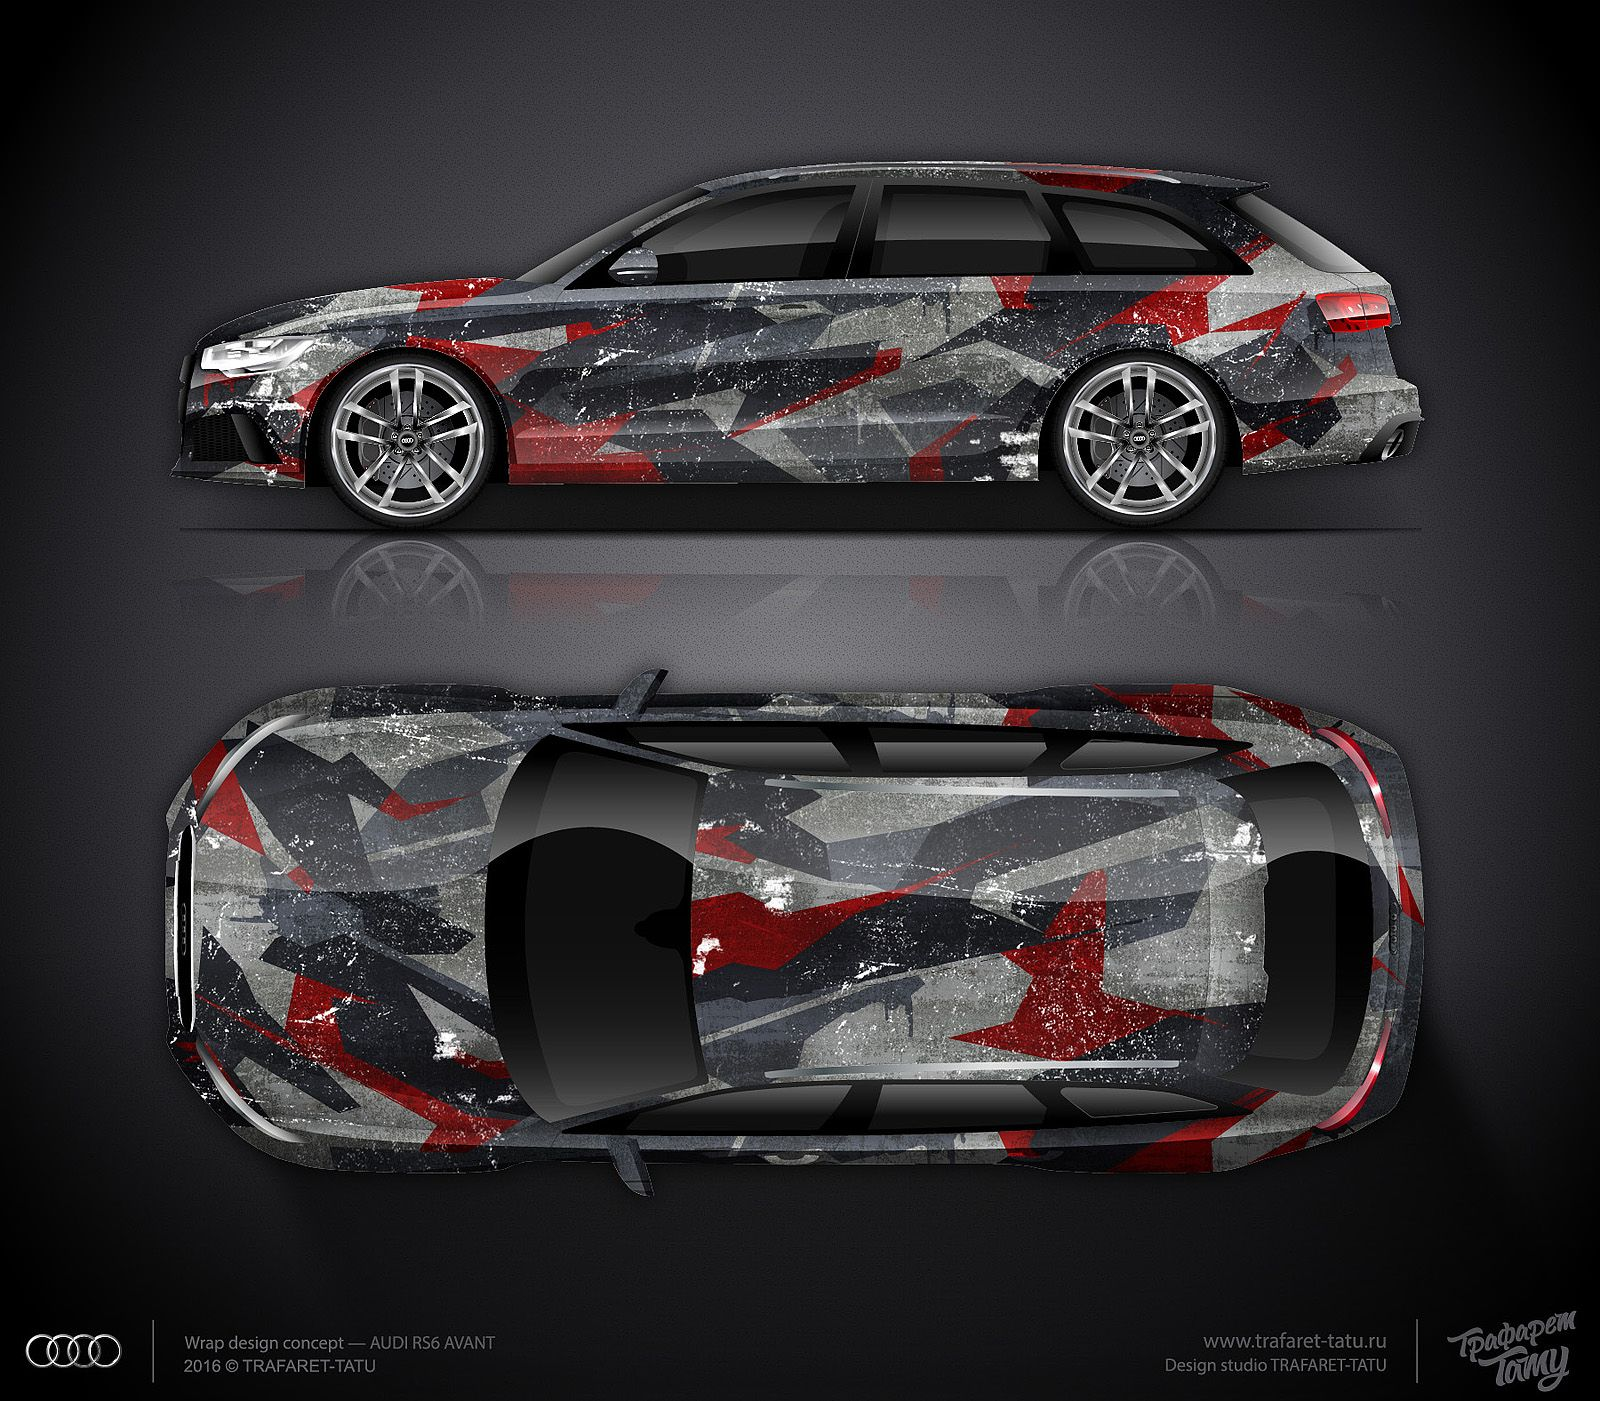 Camo Design Concept #14 For Audi RS6 Avant For Sale